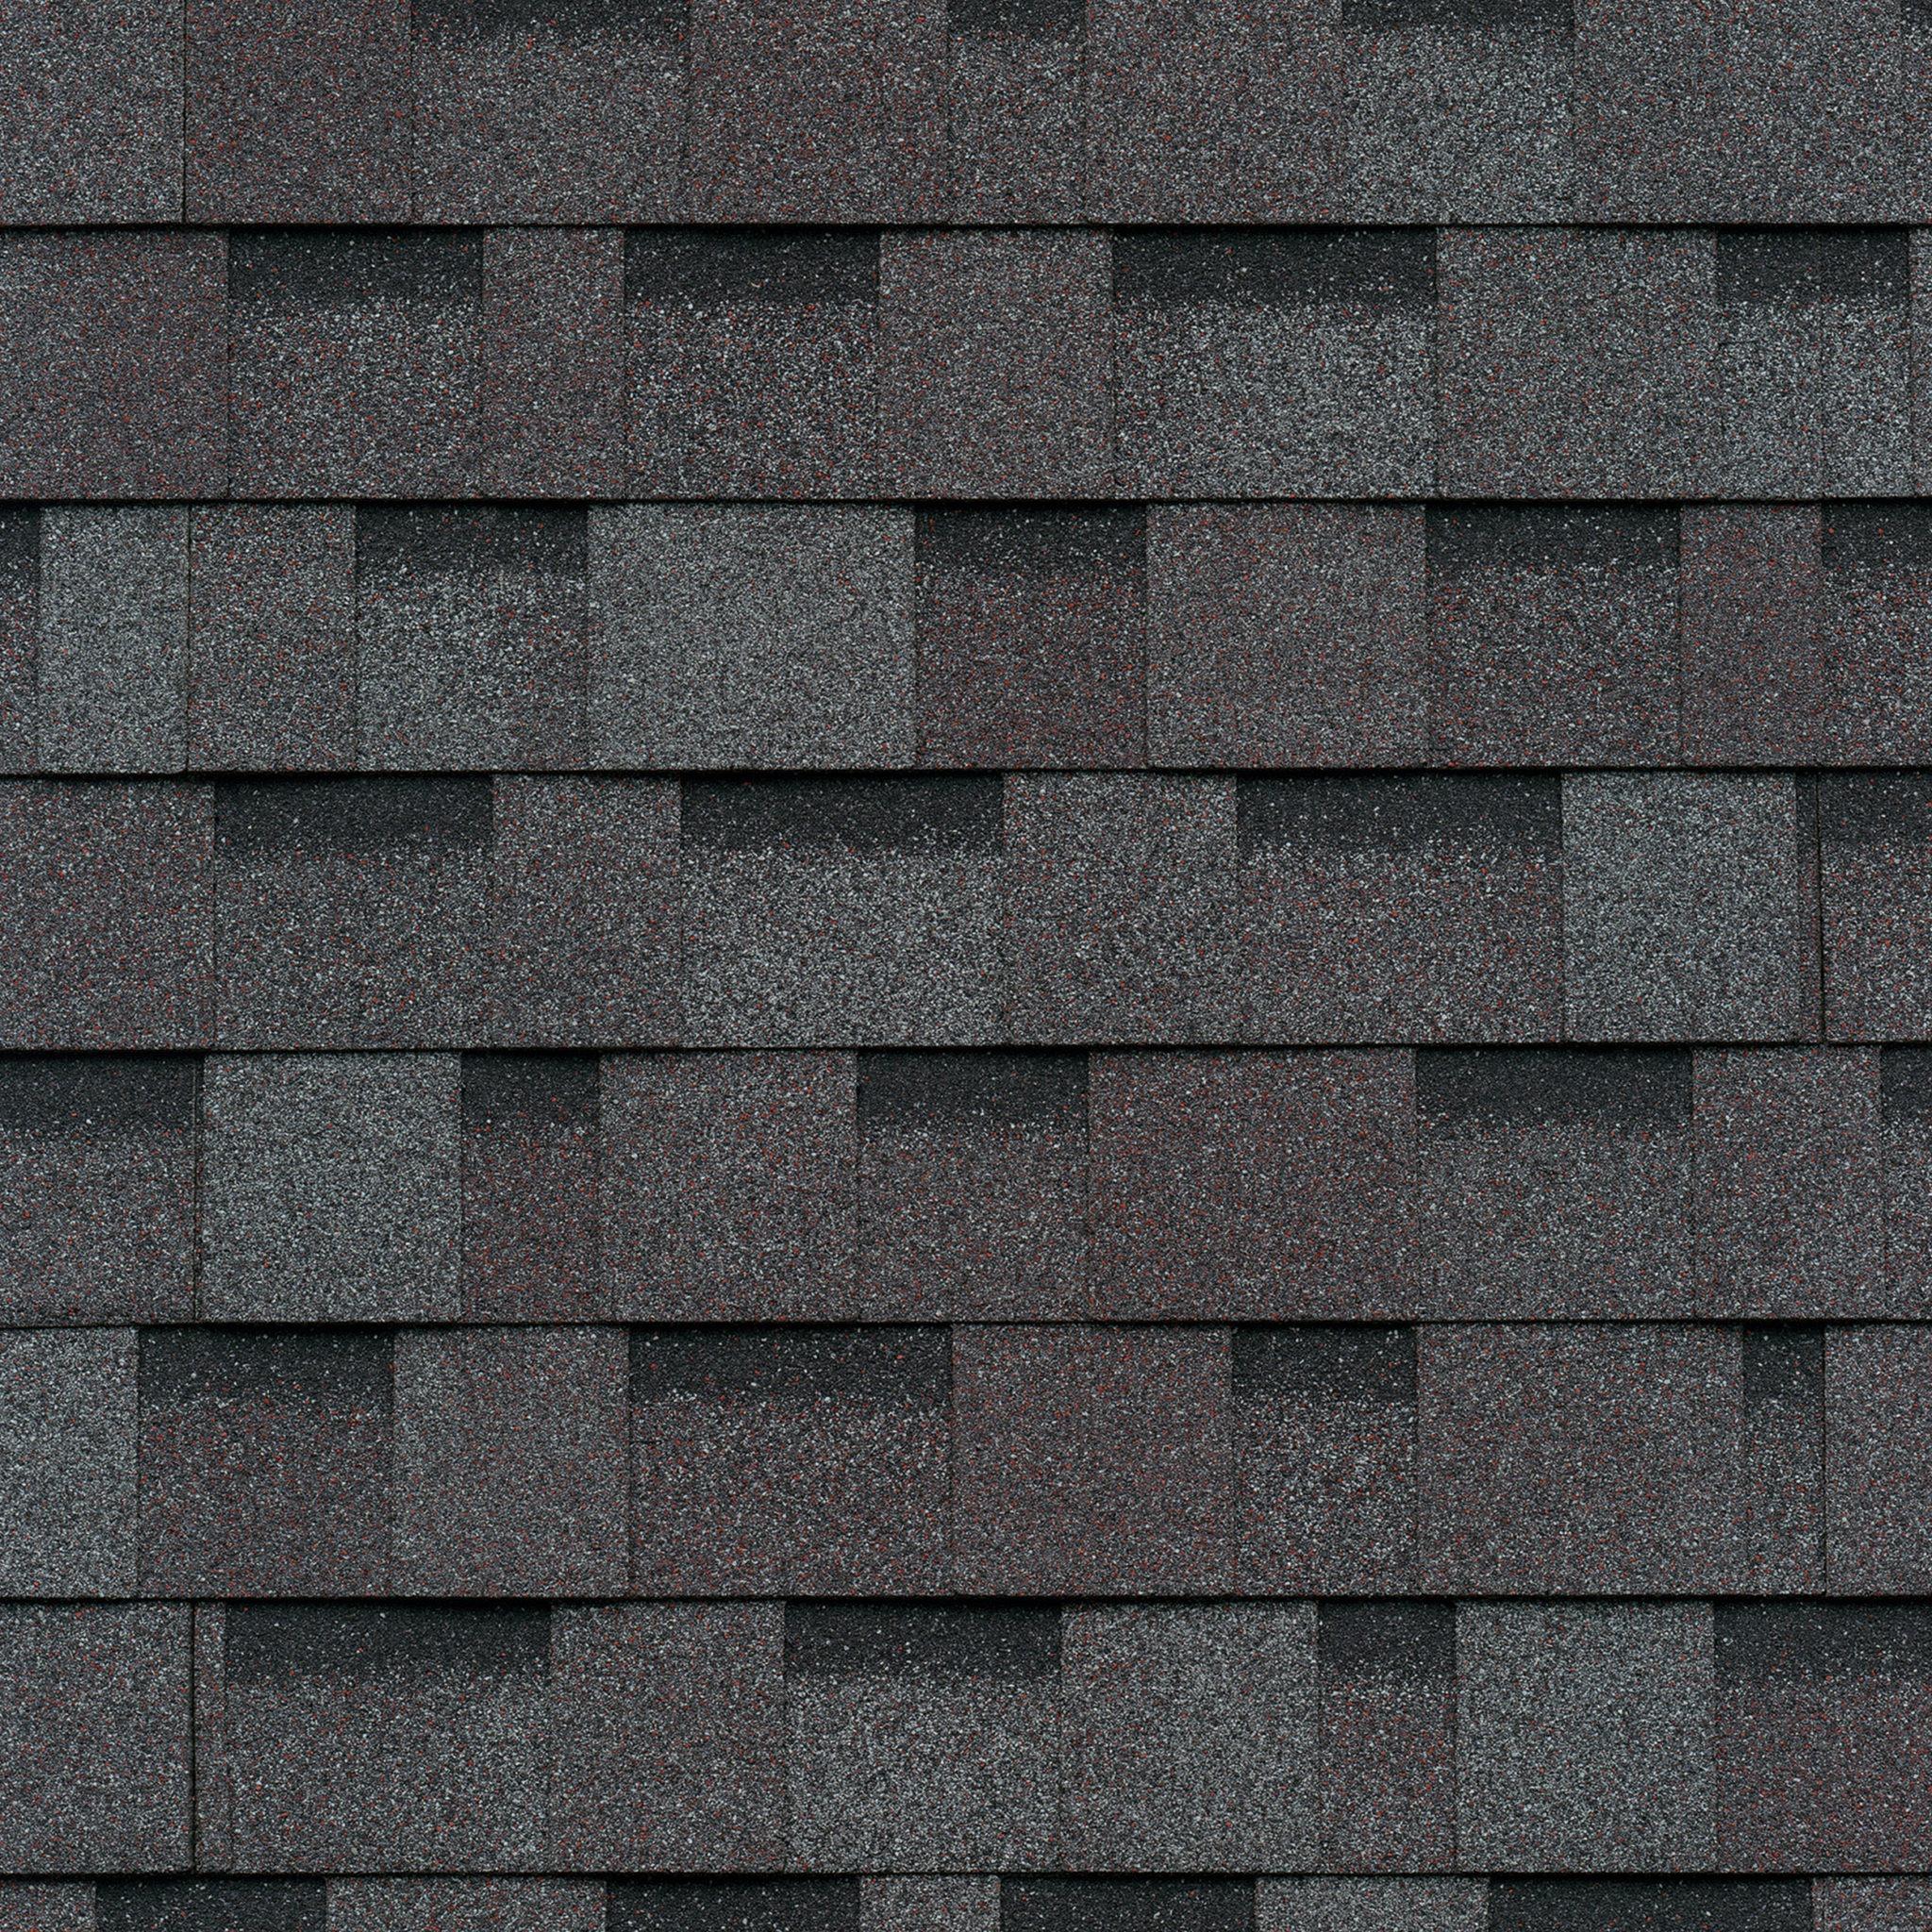 Cambridge 174 Dykstra Knight Roofing